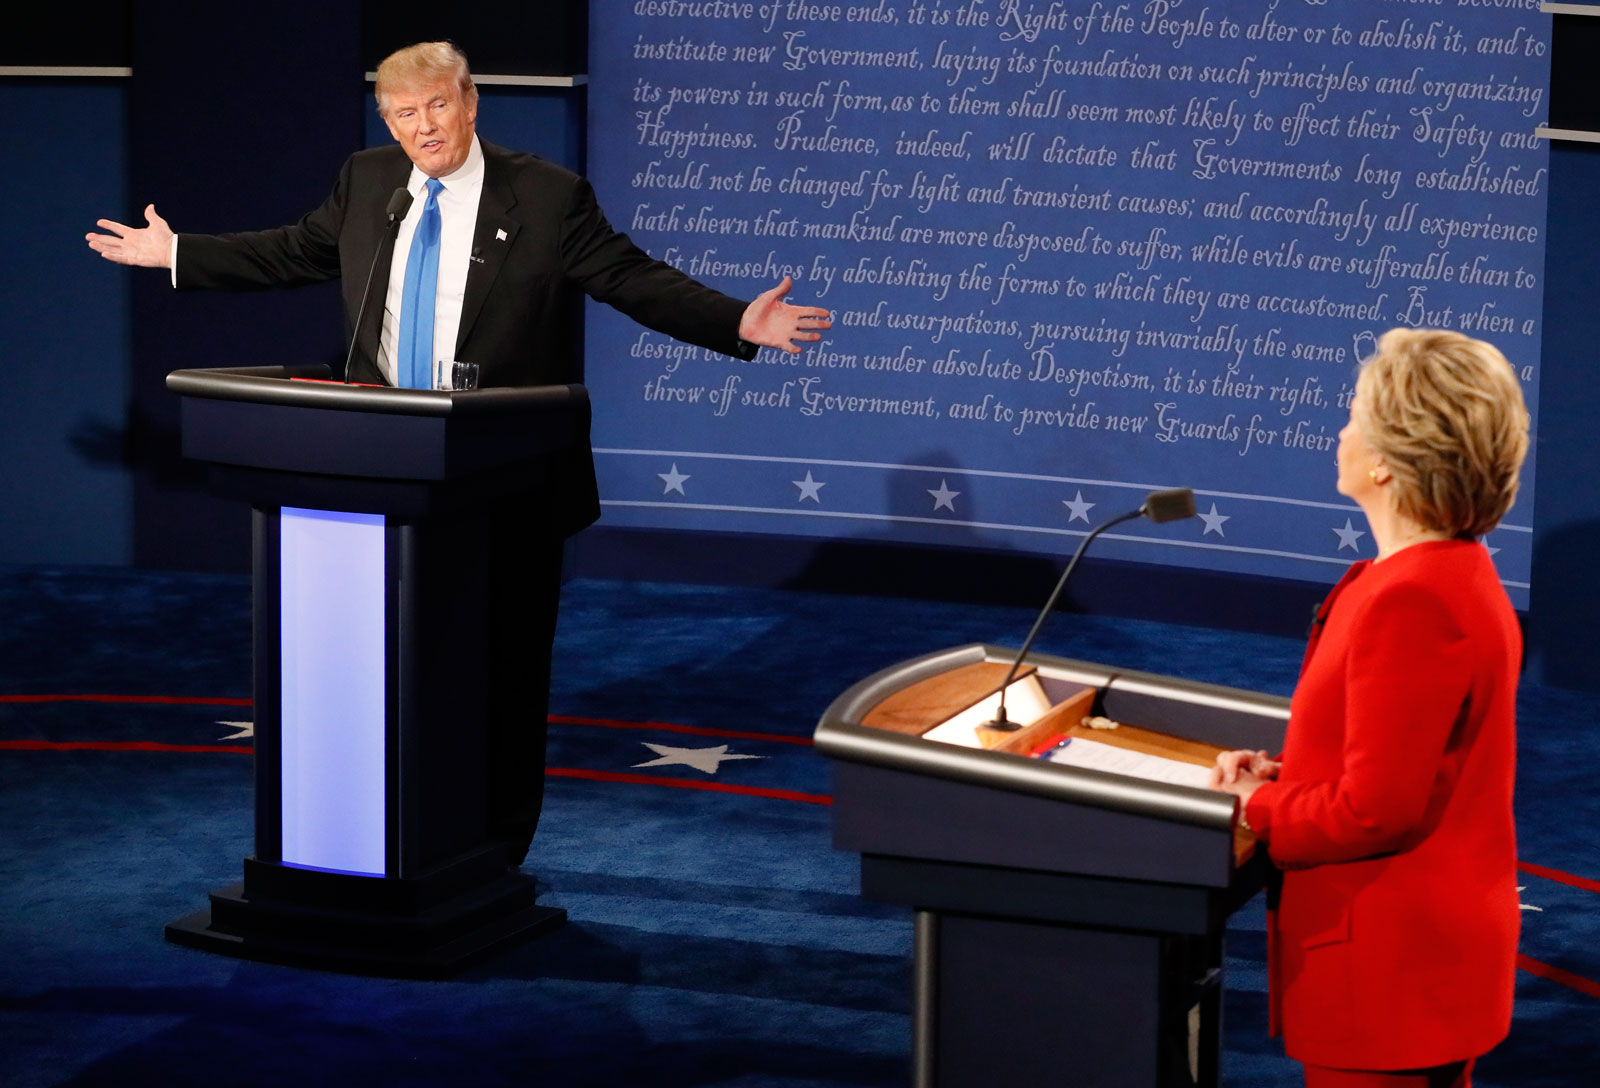 Donald Trump and Hillary Clinton during their first presidential debate, Hofstra University, Hempstead, New York, September 26, 2016